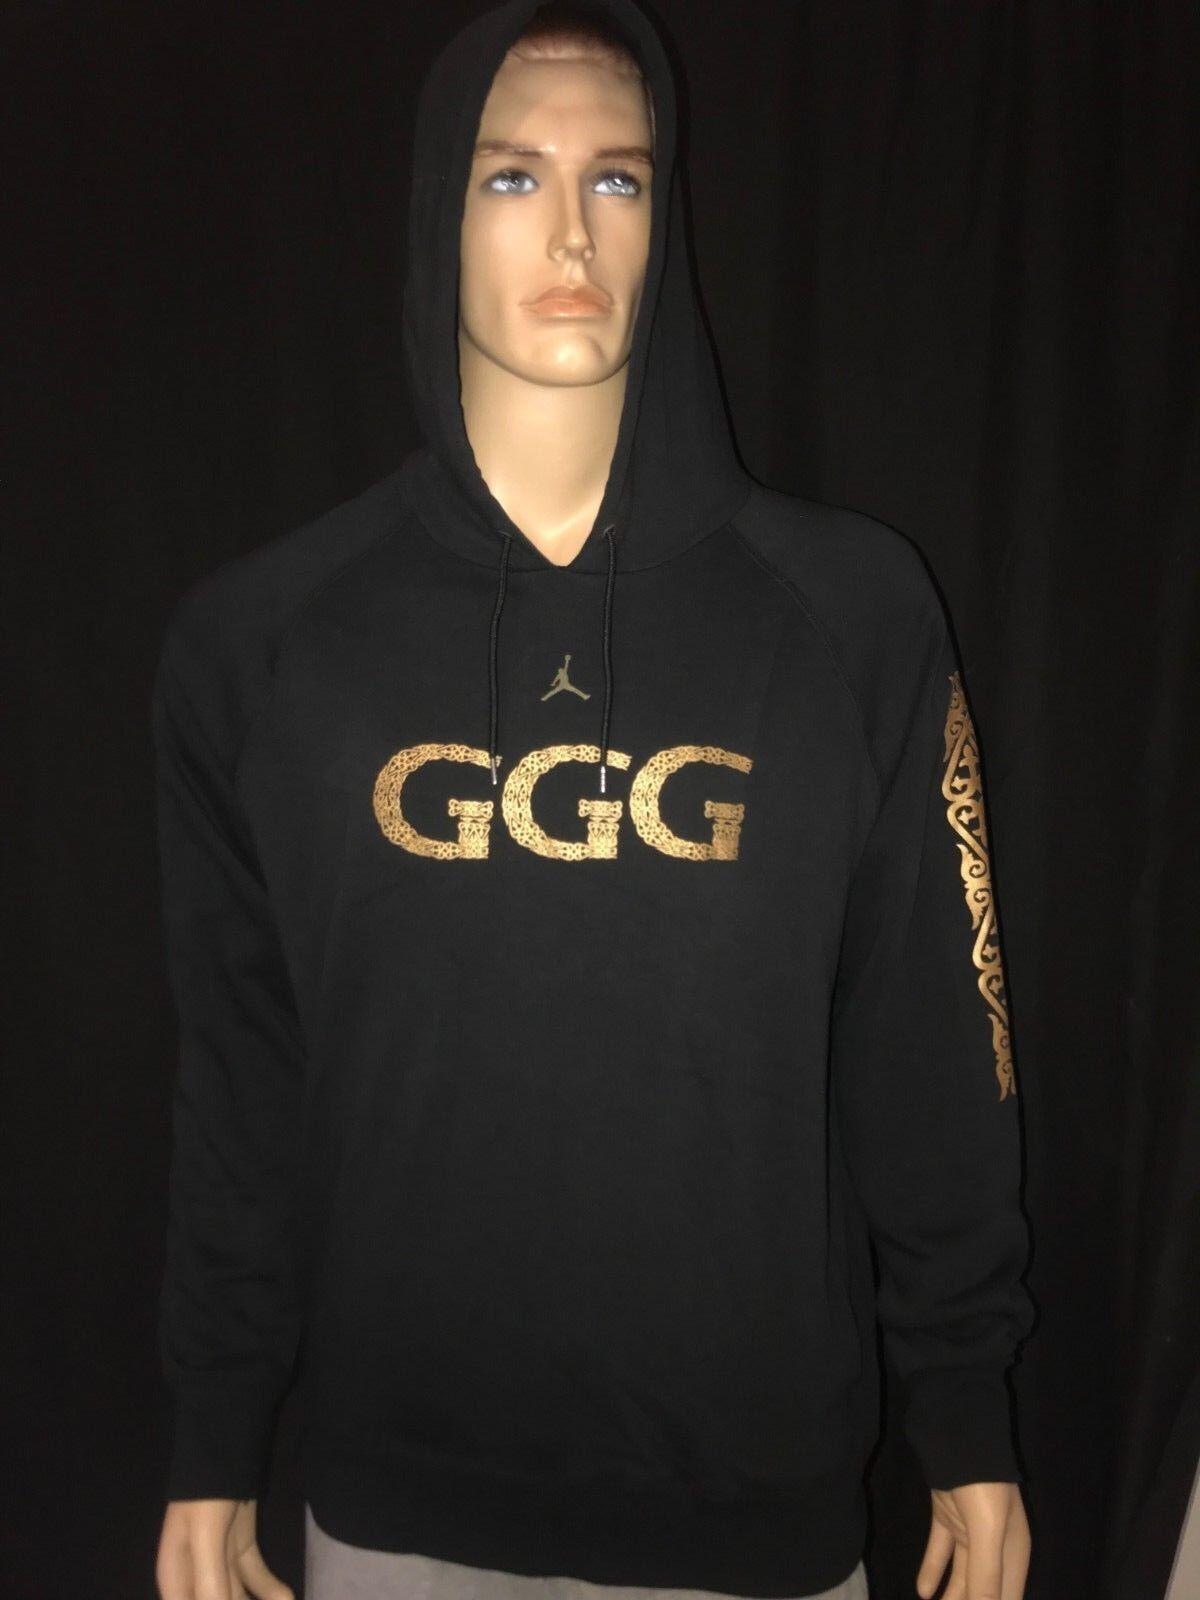 Infidelidad Moda adyacente  Nike Jordan GGG Gennady Golovkin Hoodie Black Gold RARE Size M Aq8822 010  for sale online   eBay